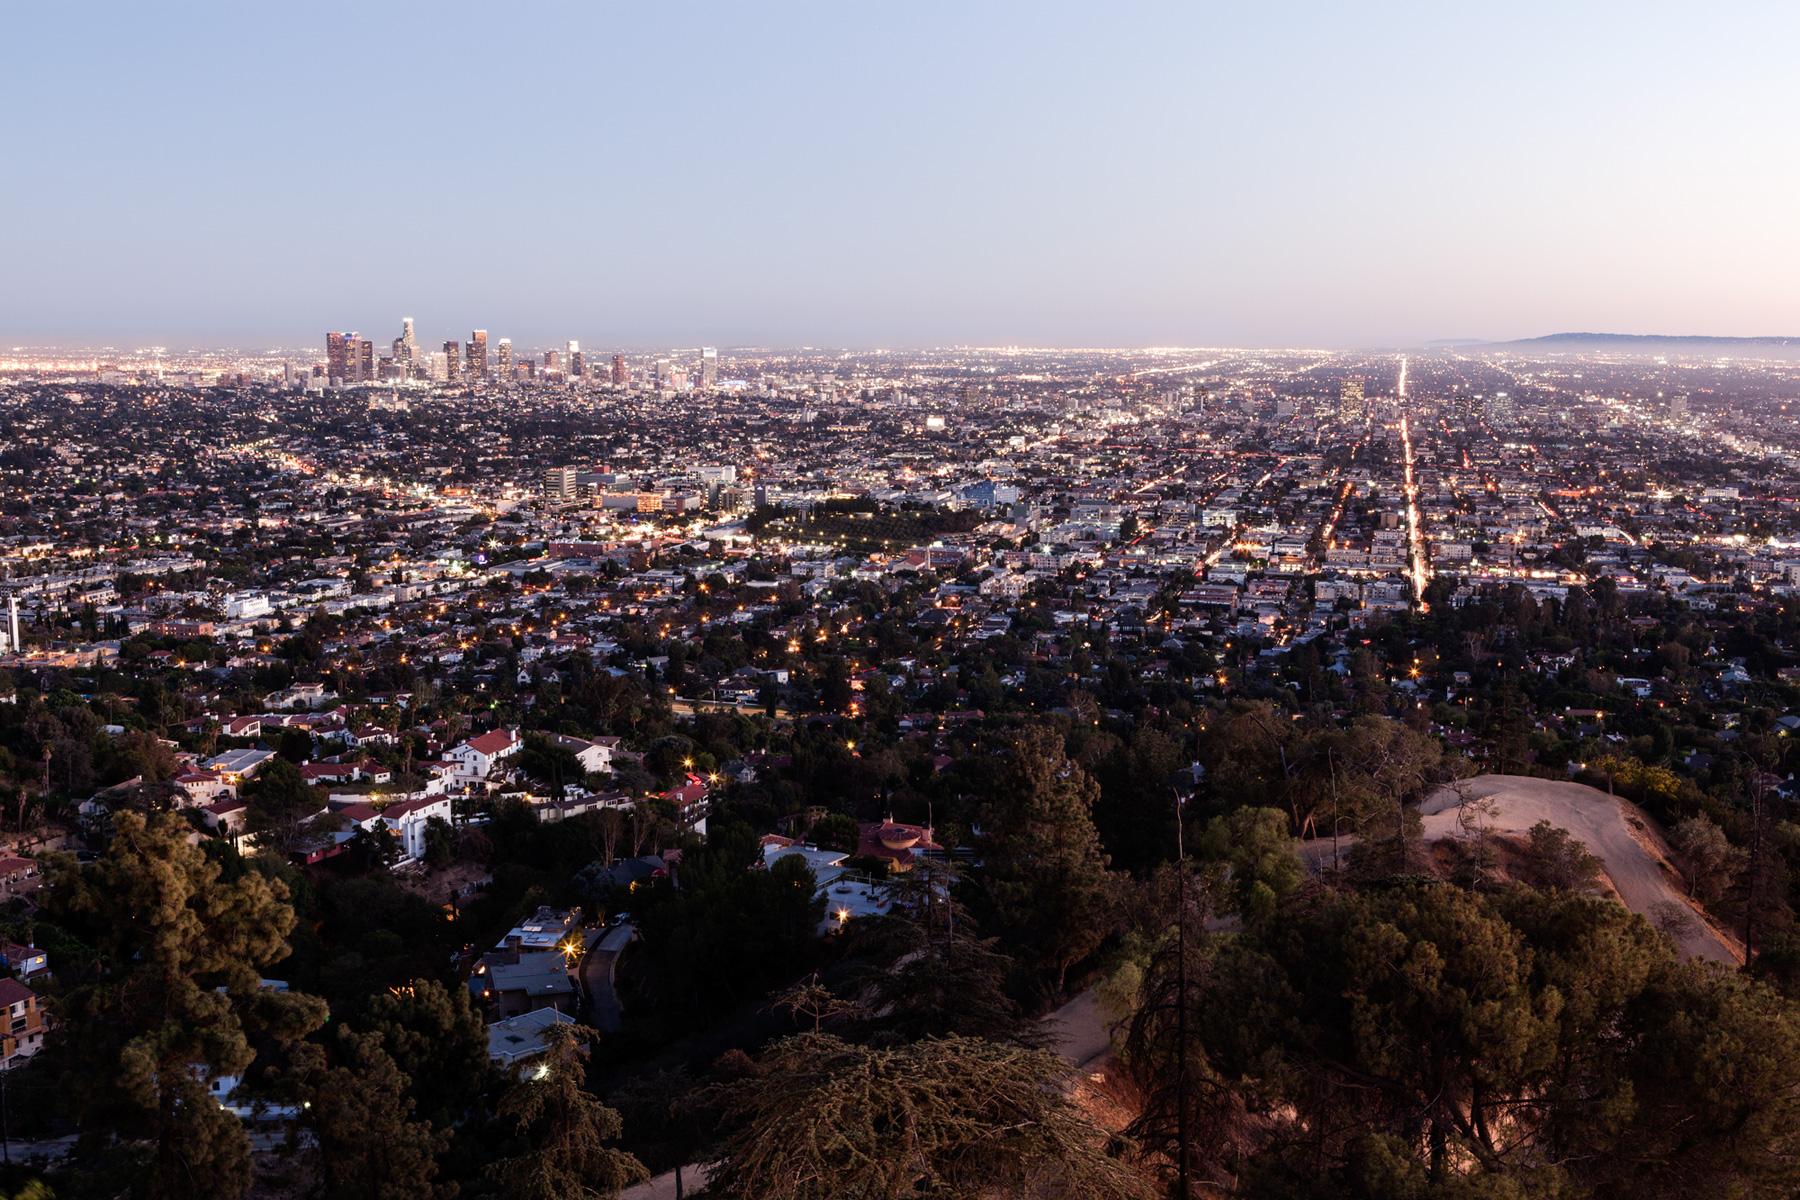 LOS ANGELES / PERSONAL WORK